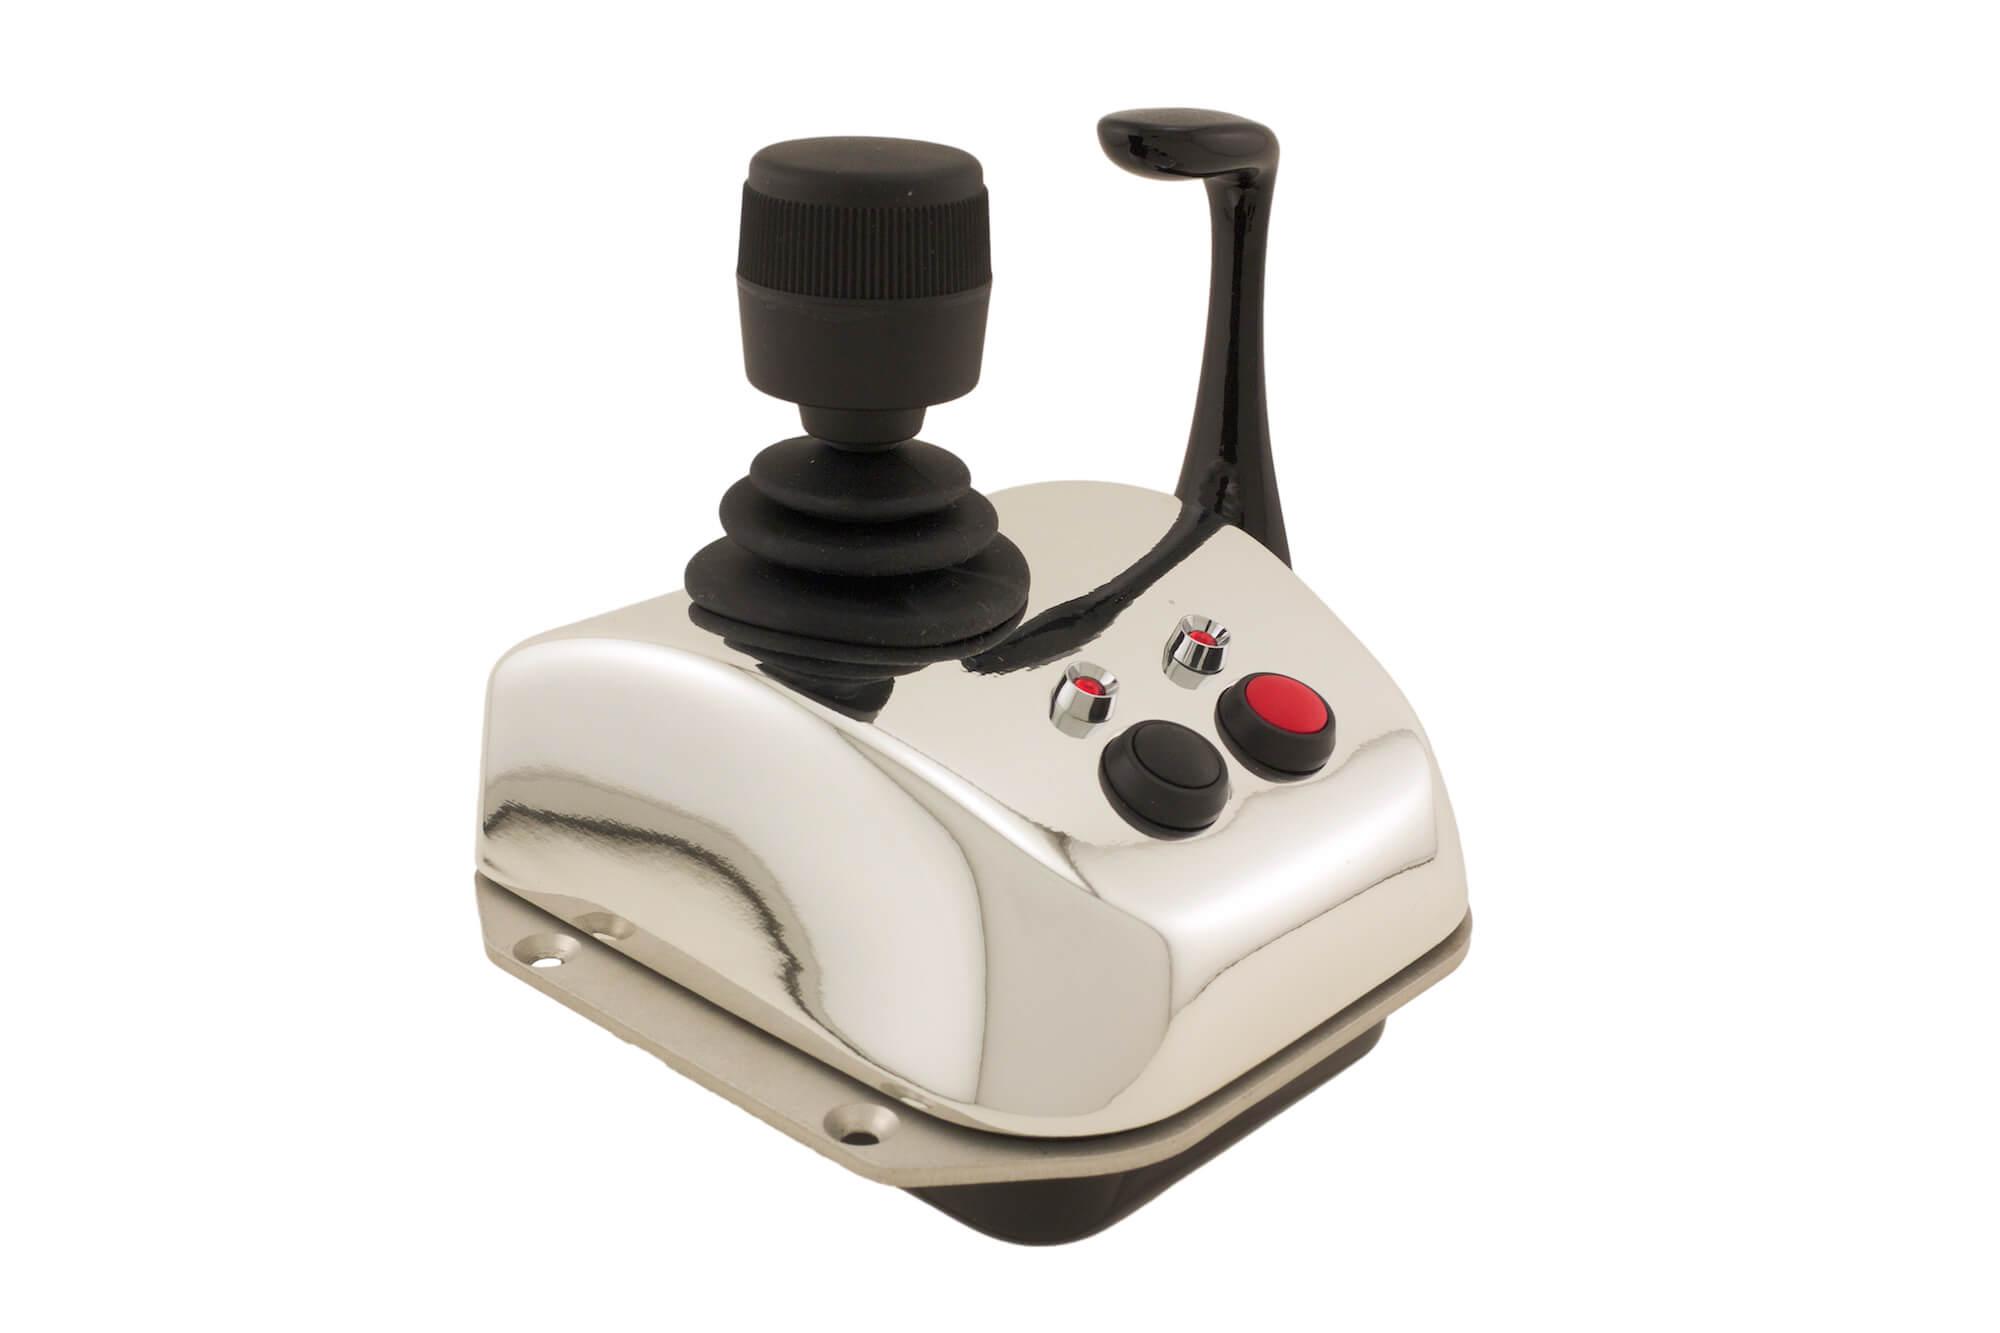 hight resolution of propilot s joystick